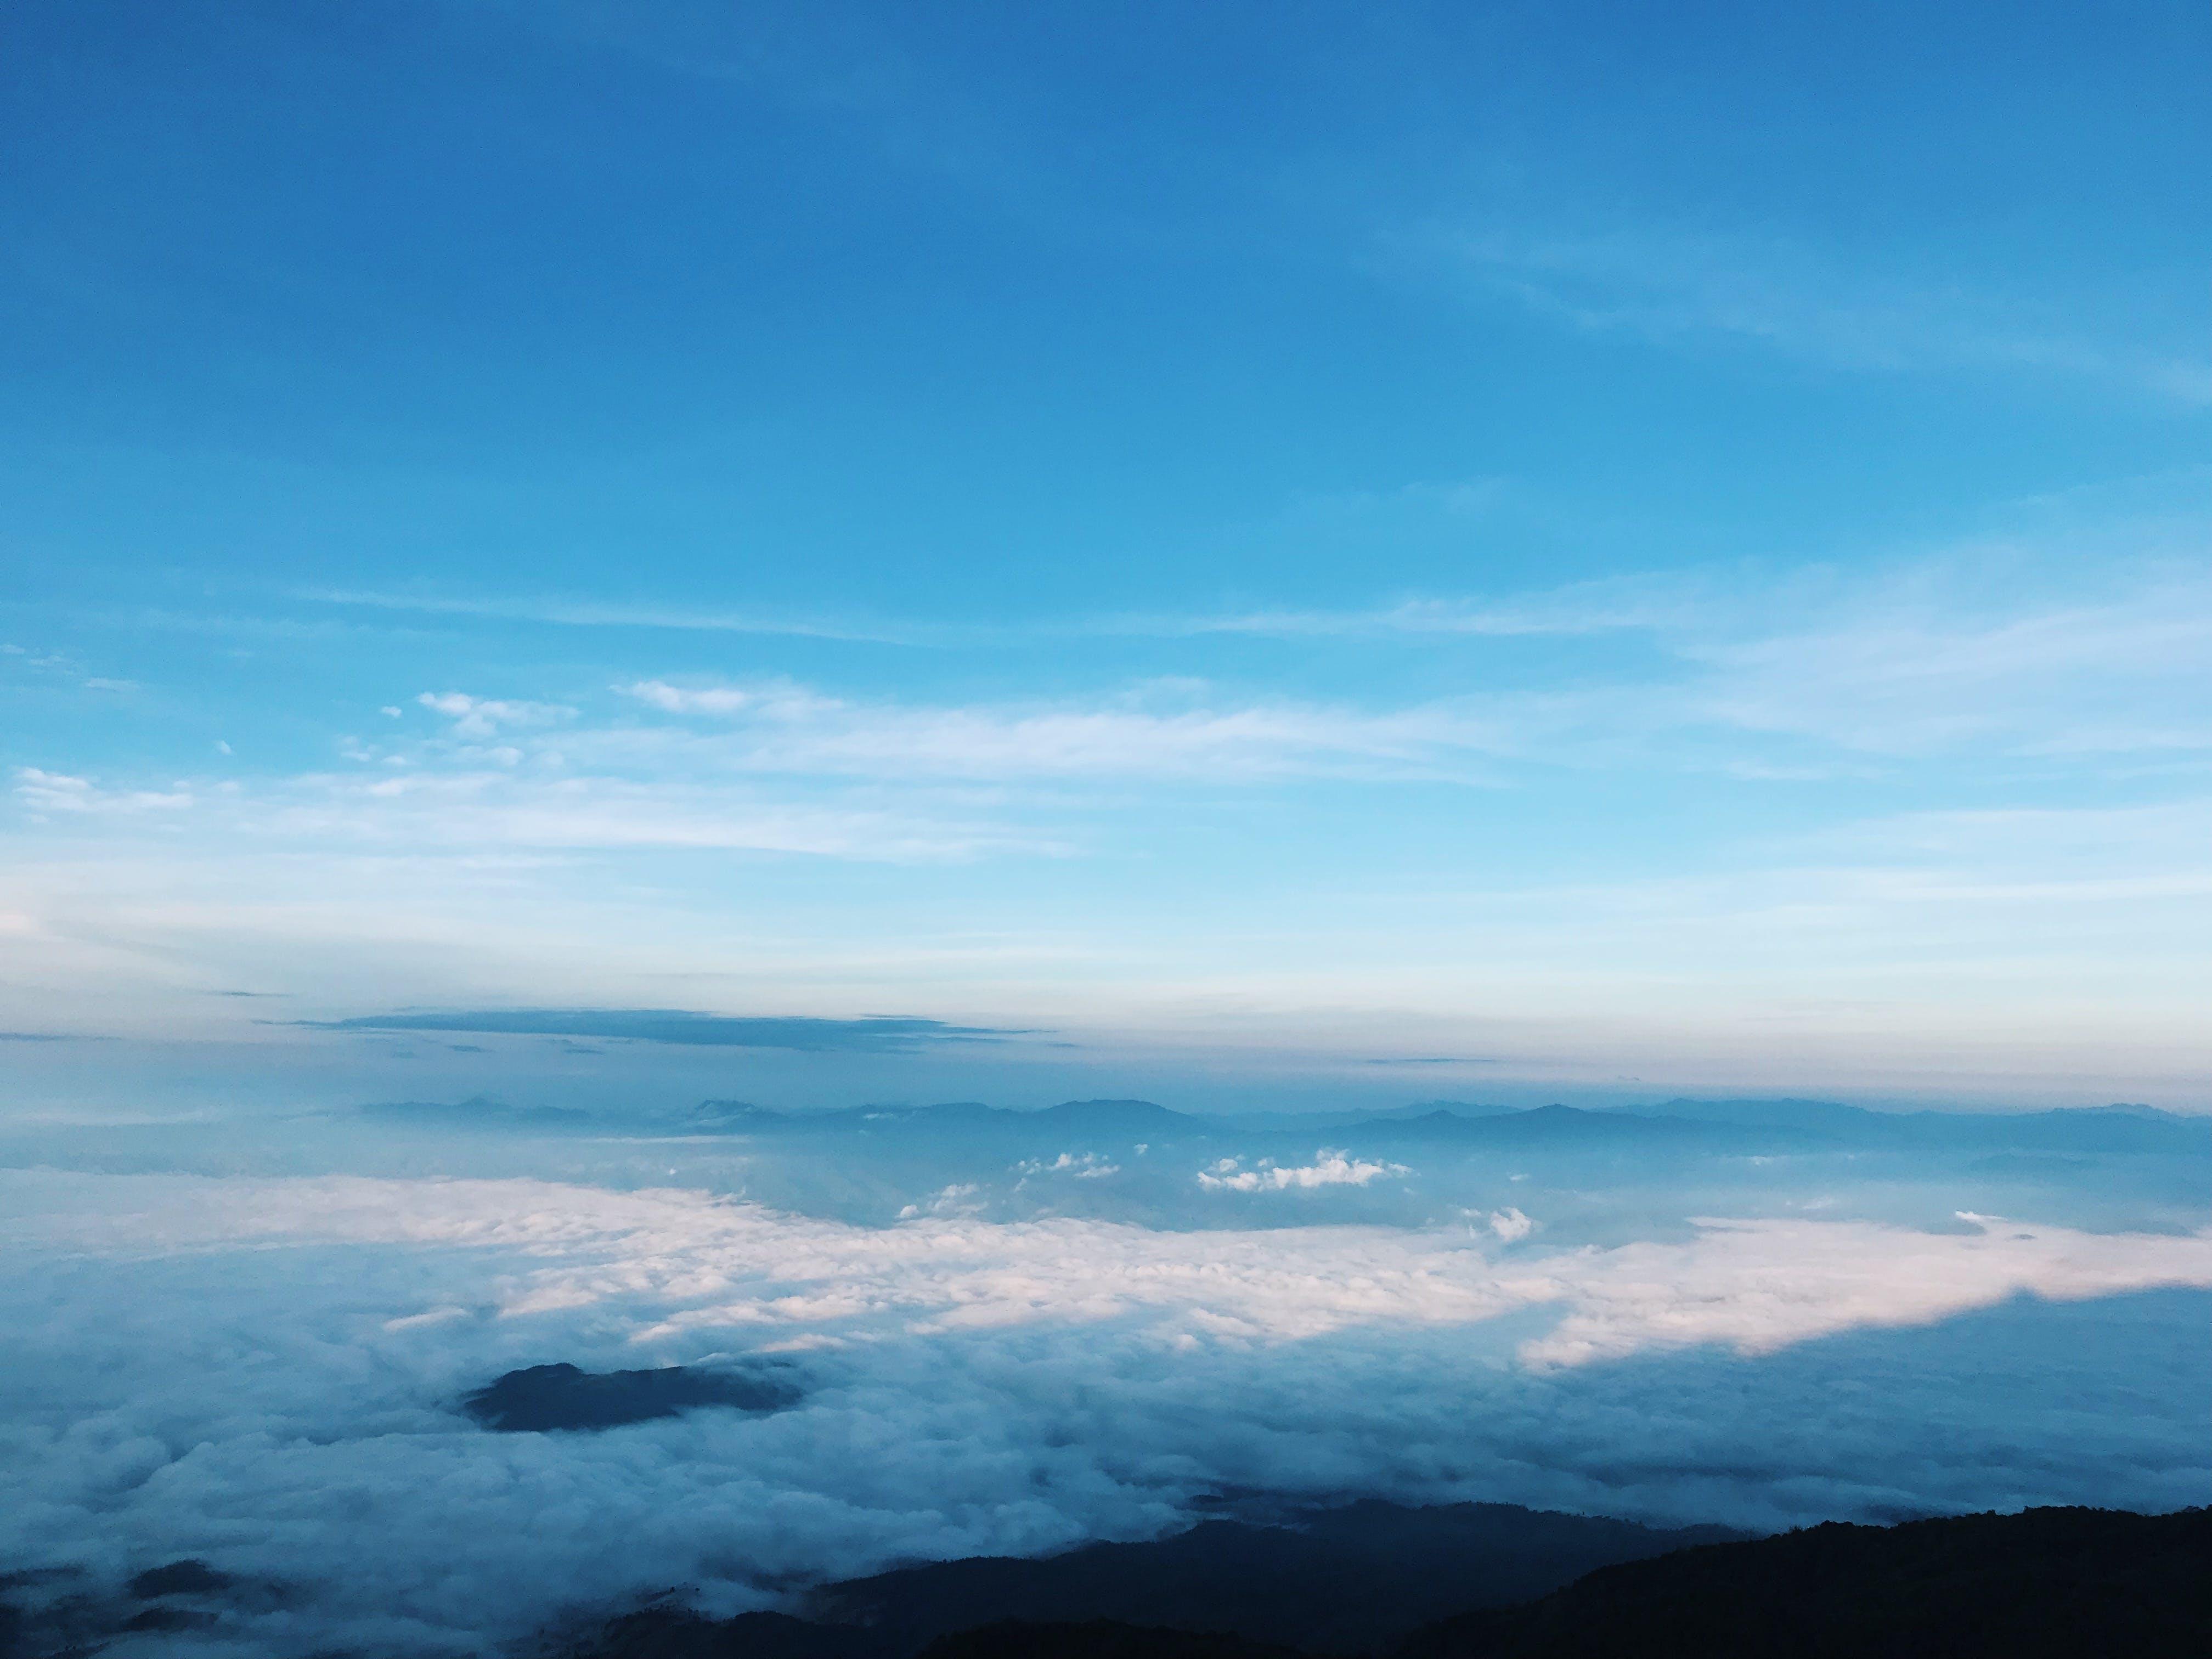 Aerial Photo of Sky